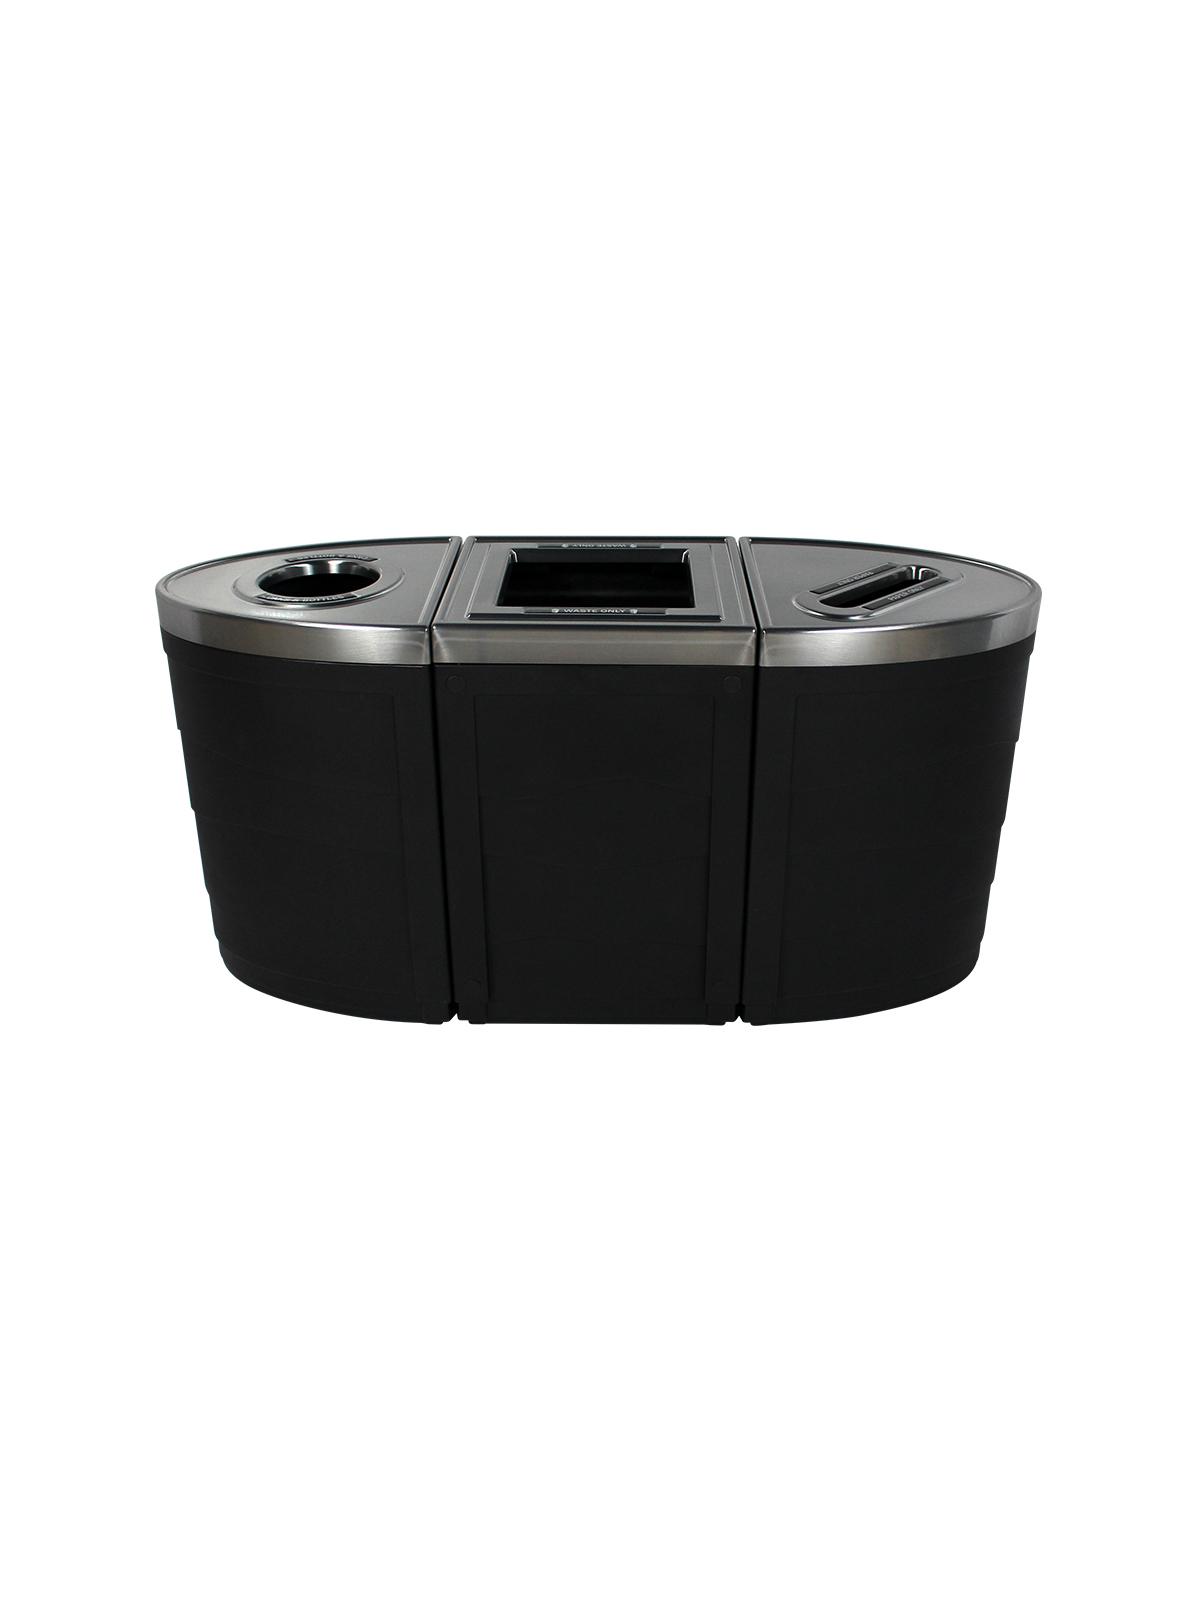 EVOLVE - Triple - Cans & Bottles-Waste-Paper - Circle-Full-Slot - Black